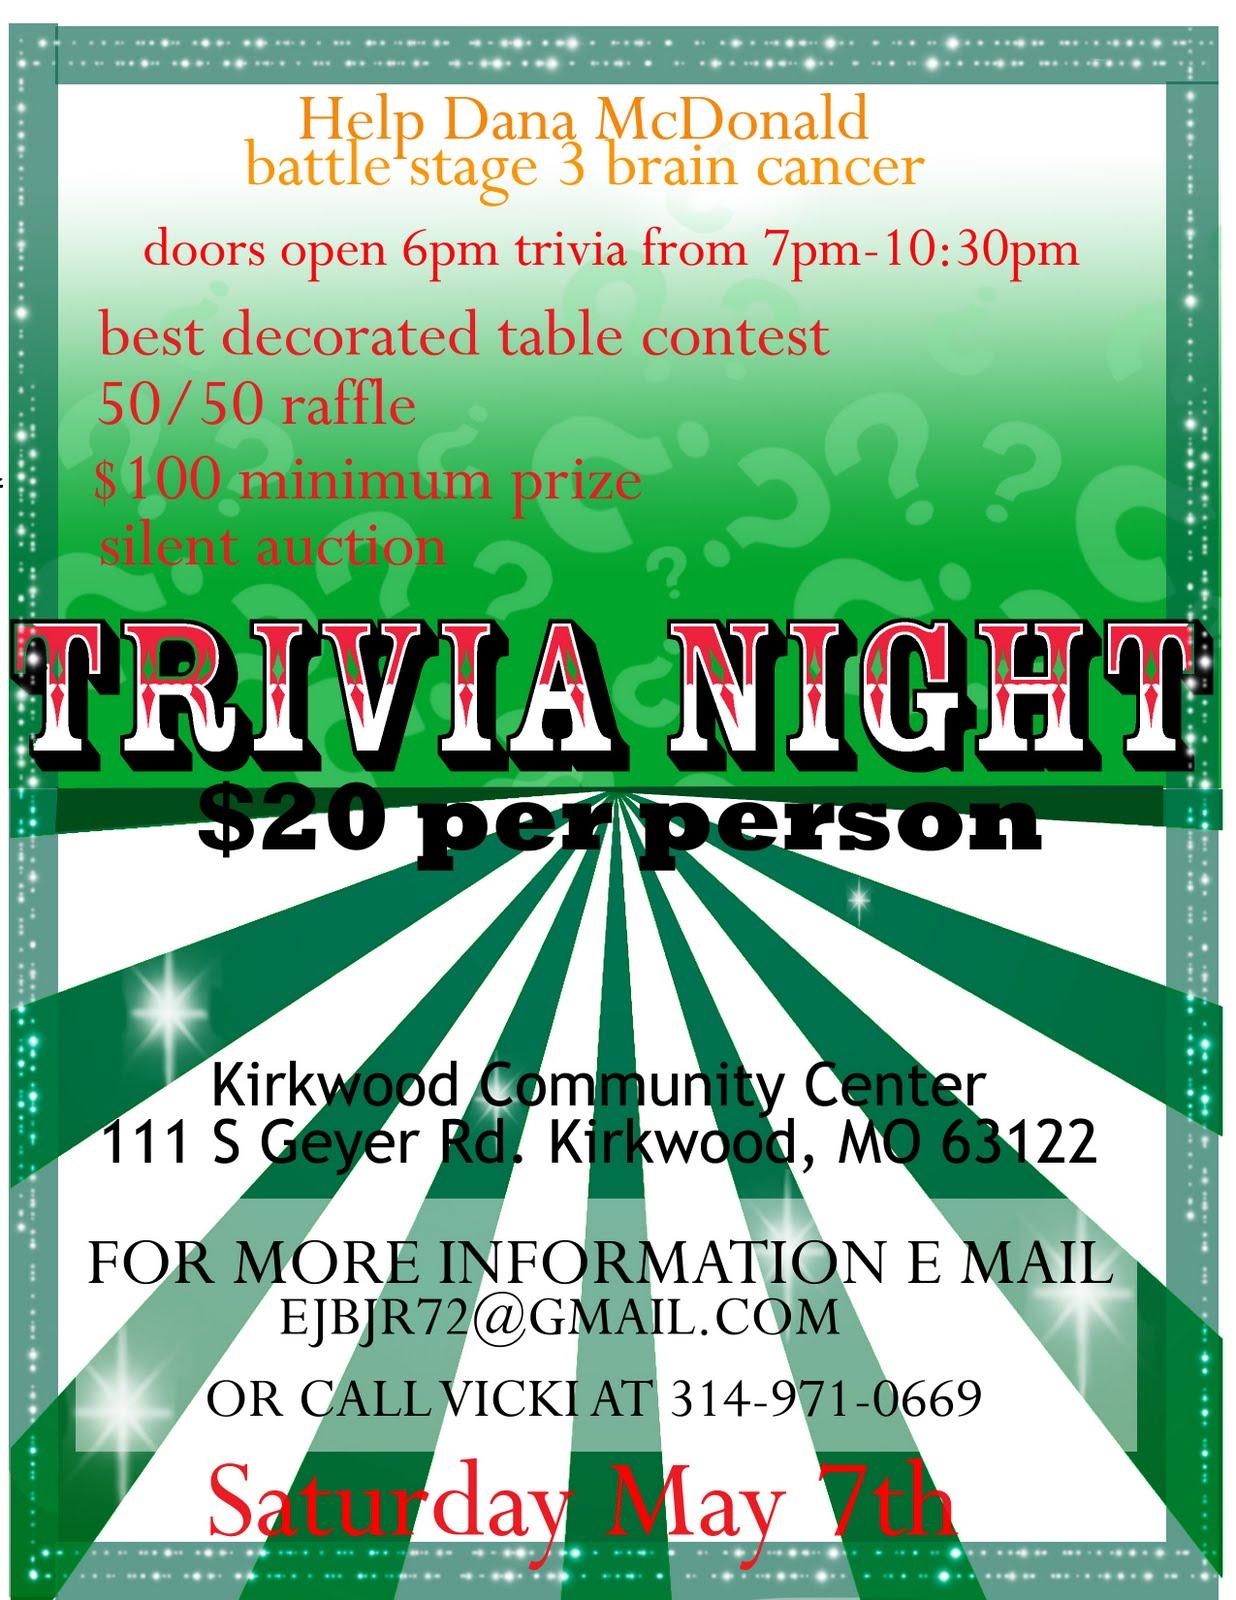 Quiz Night Poster Template edward alderton theatre news quiz – Quiz Night Poster Template Free